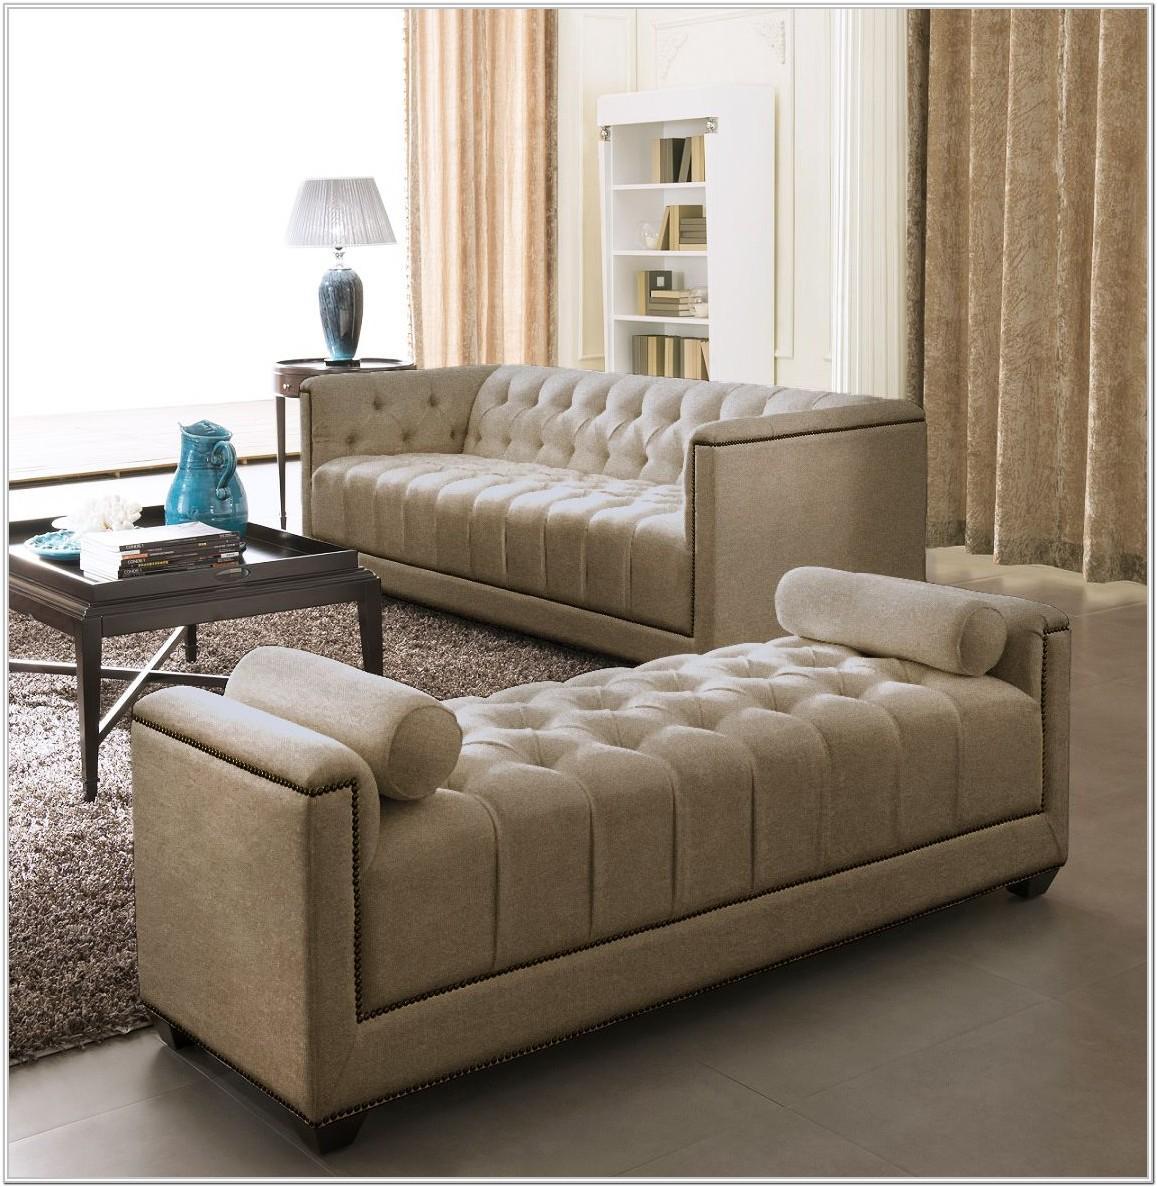 Living Room Furniture Set Ideas